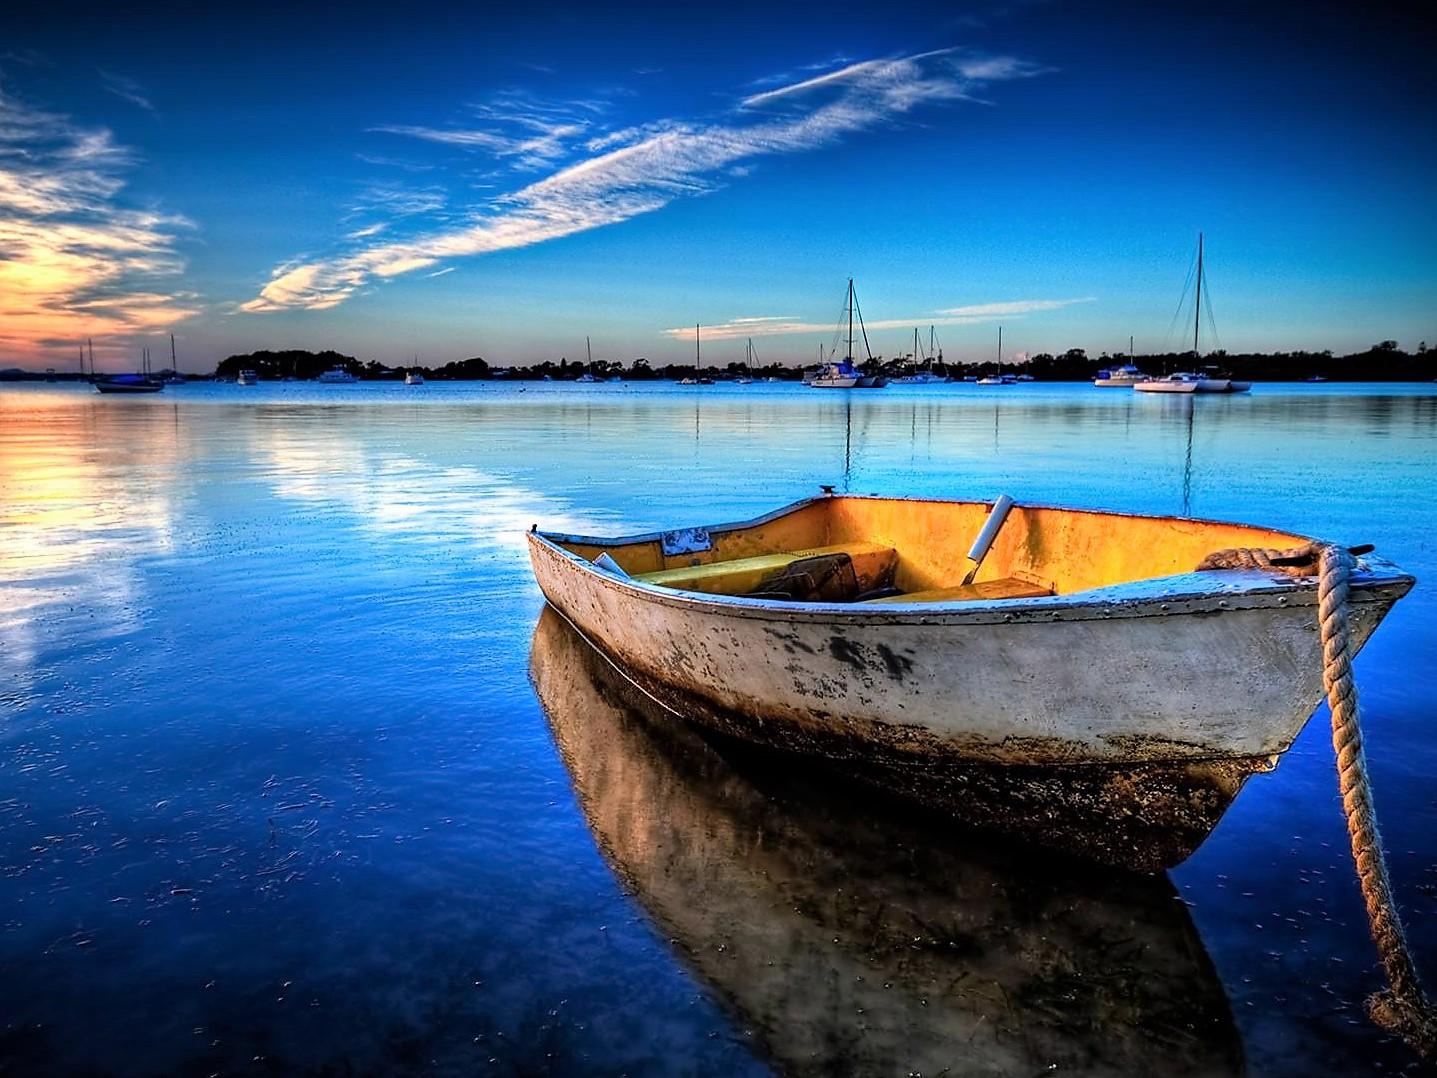 Boats / Yachts